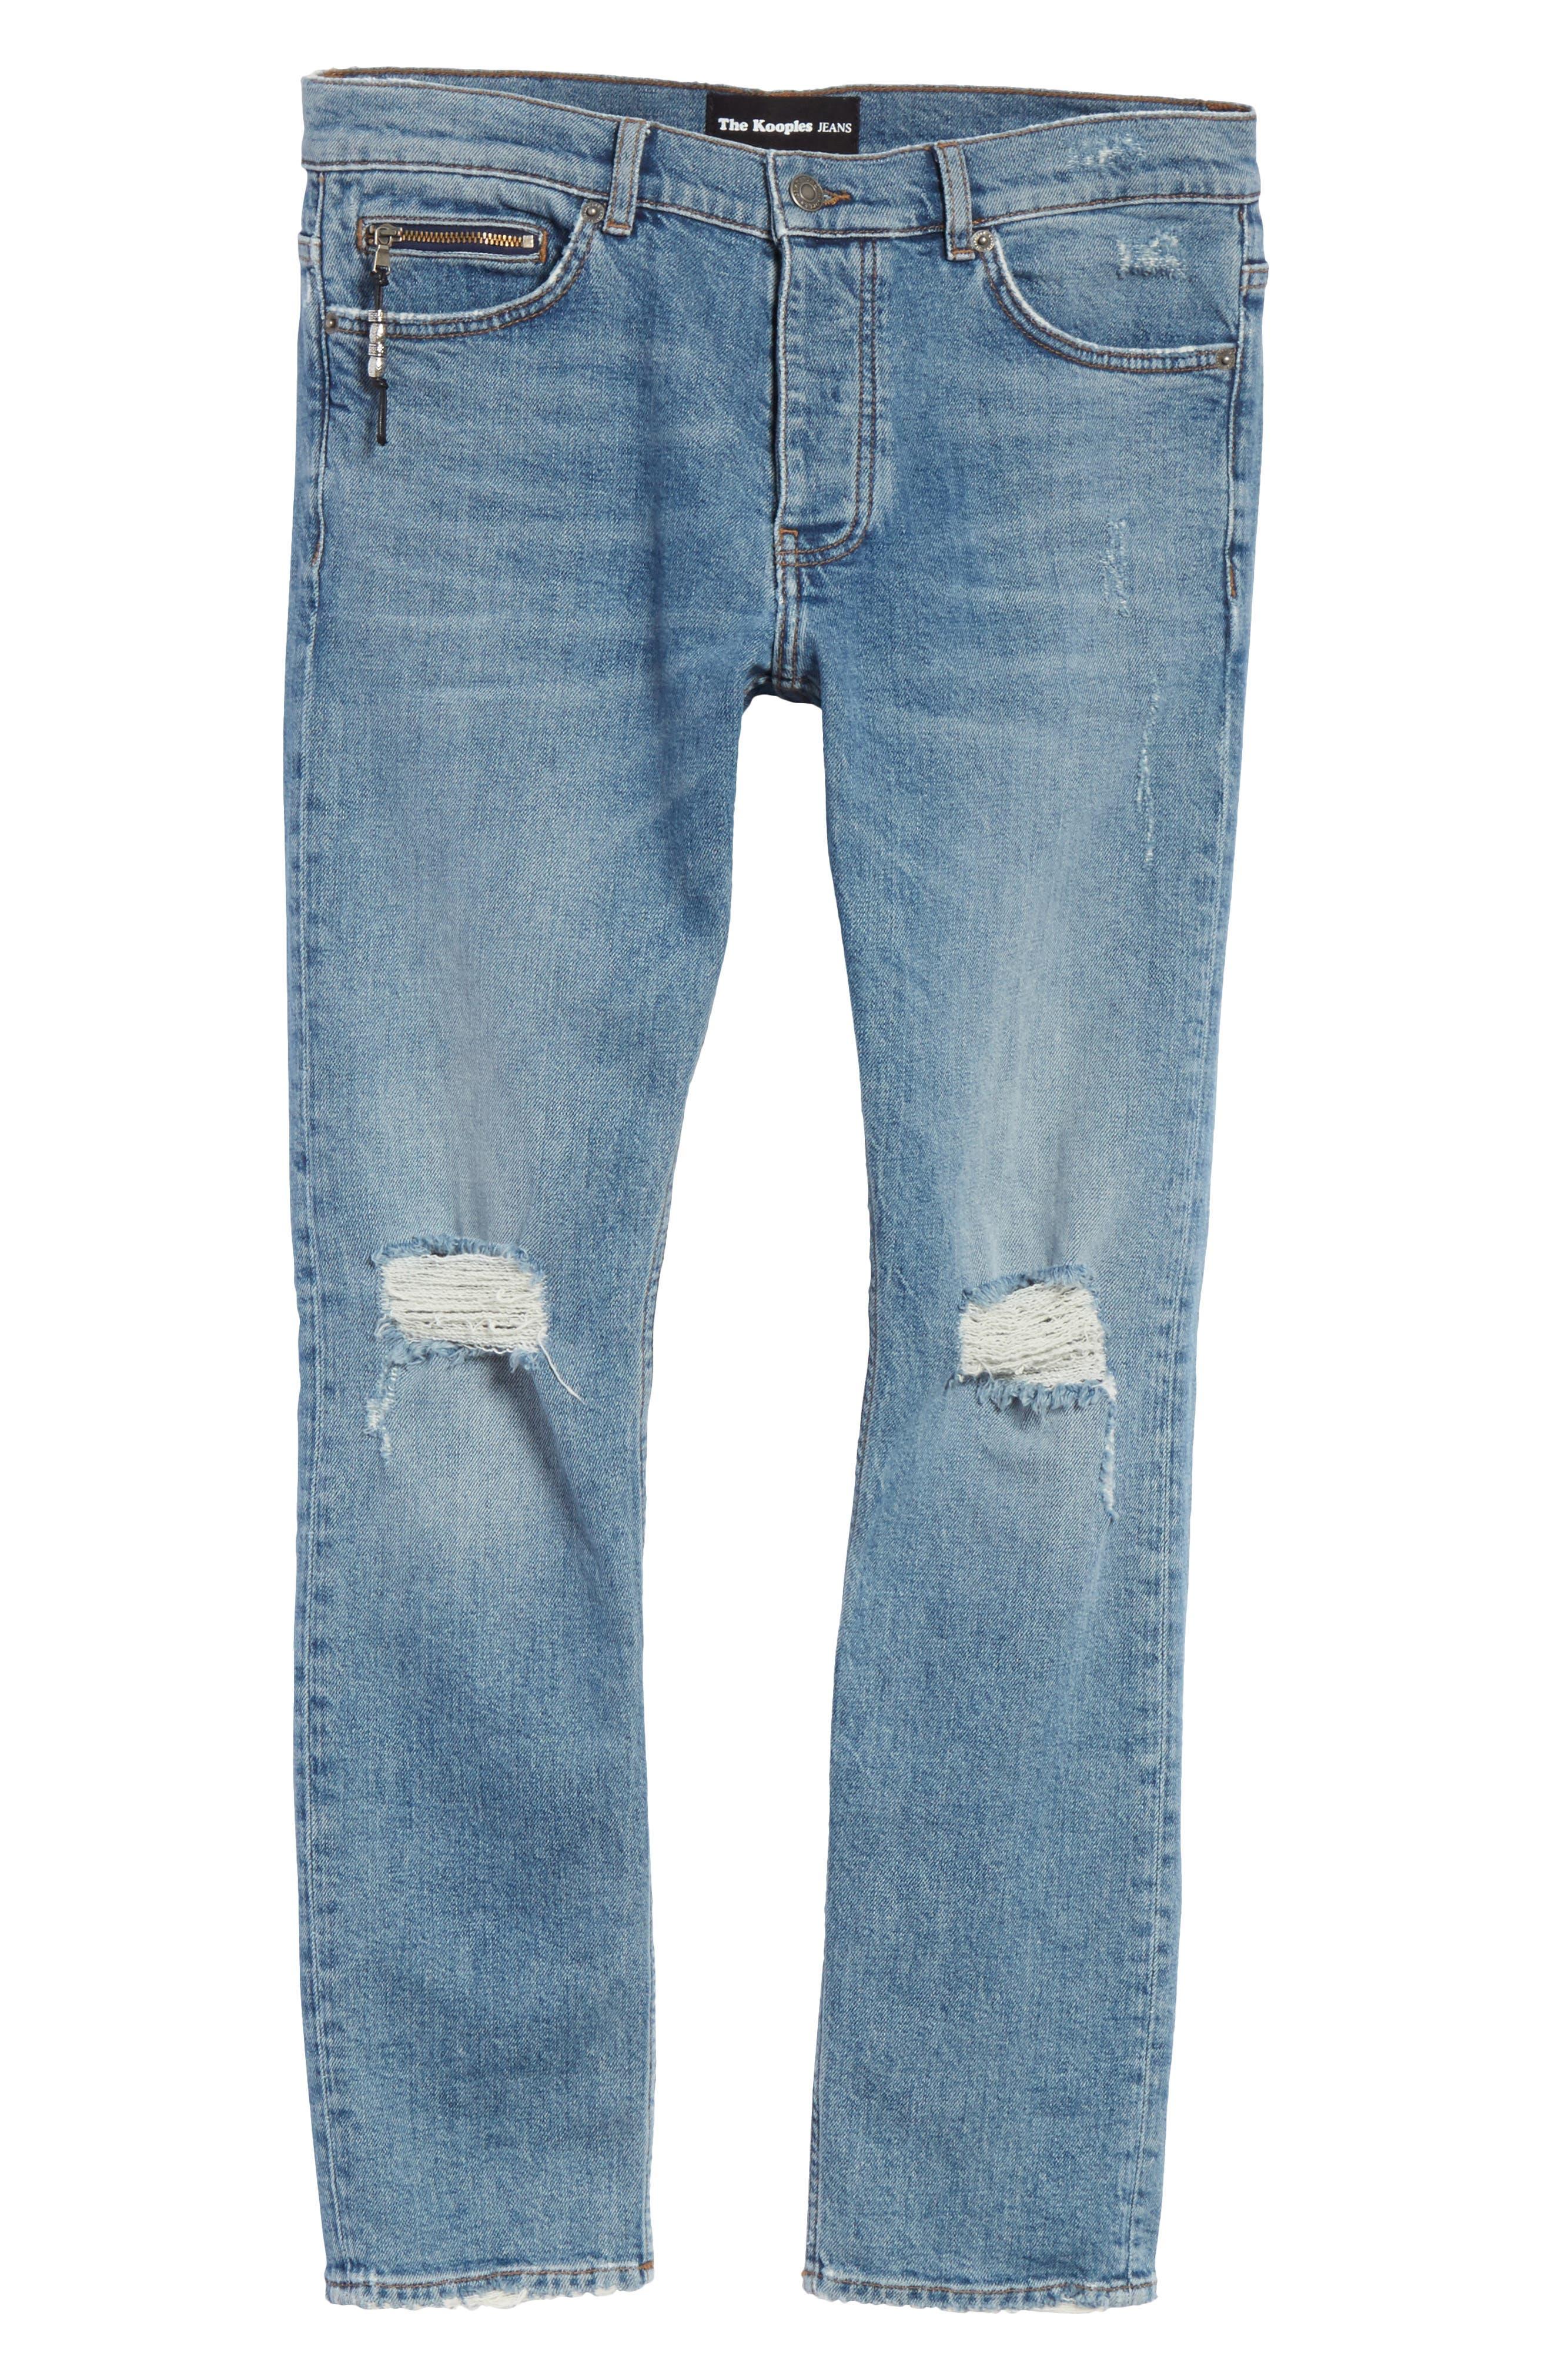 Destroyed Skinny Fit Jeans,                             Alternate thumbnail 6, color,                             400